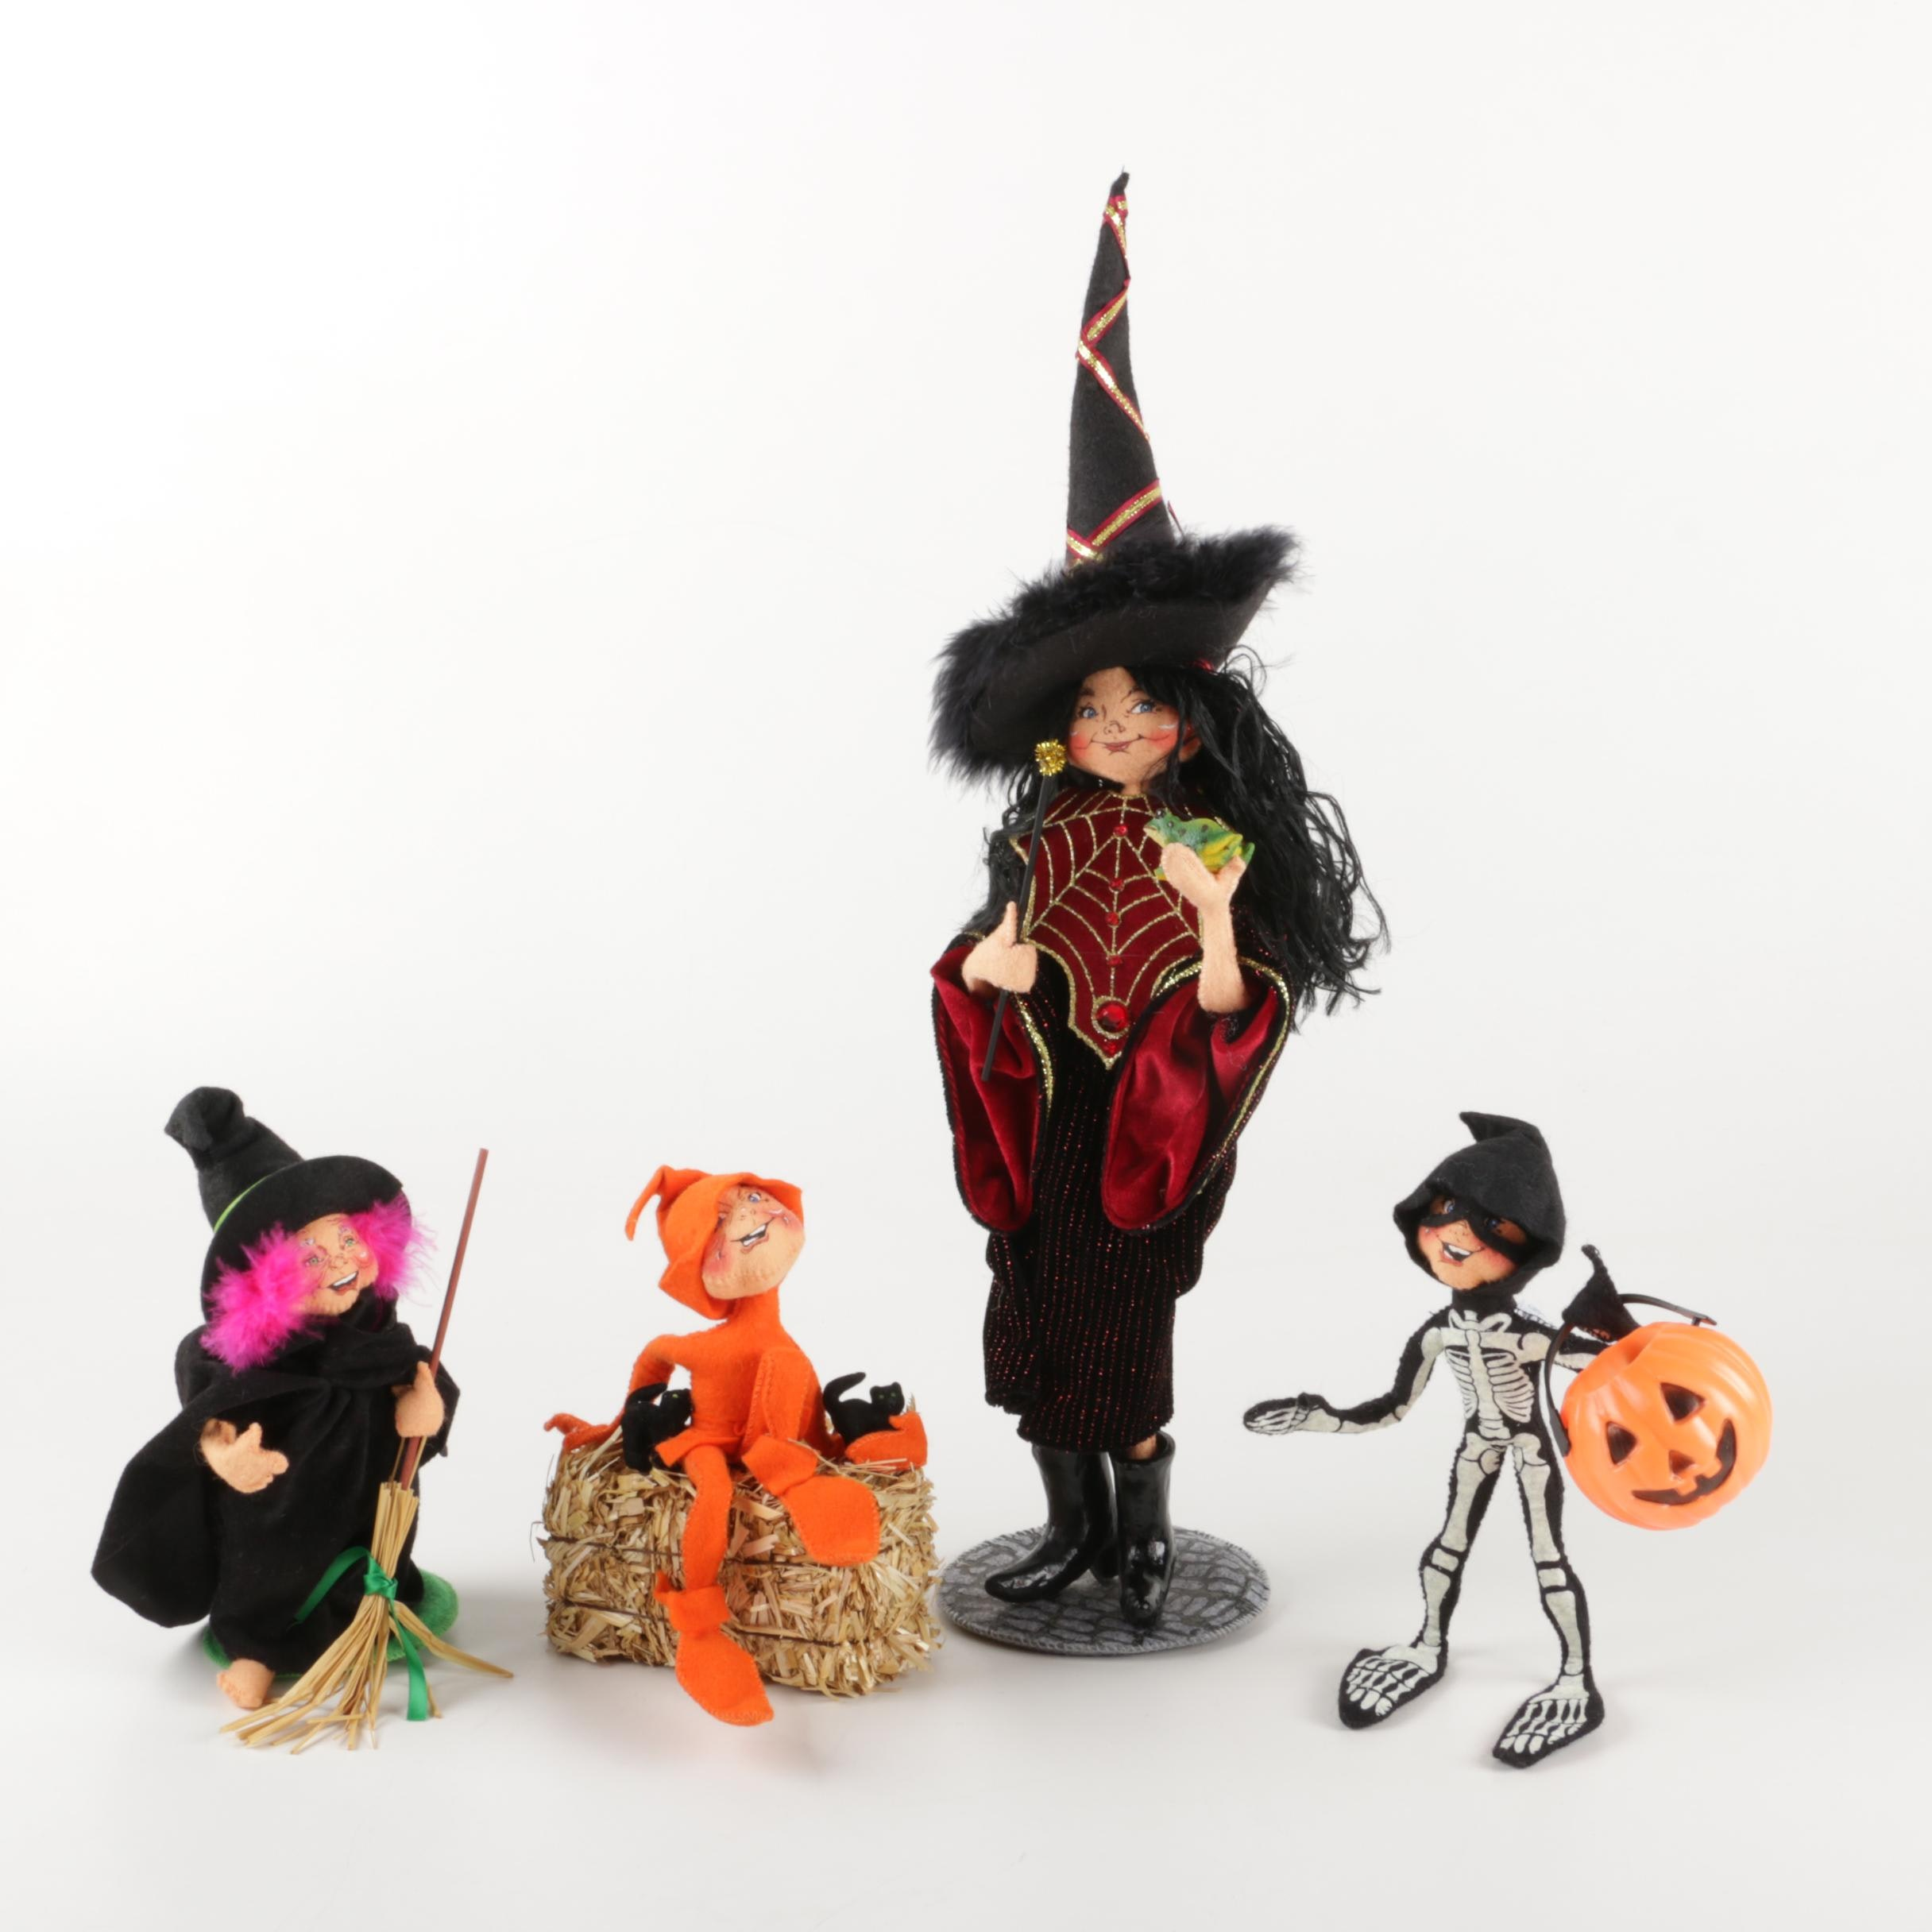 Hand-Stitched Annalee Halloween Witch and Figurine Set